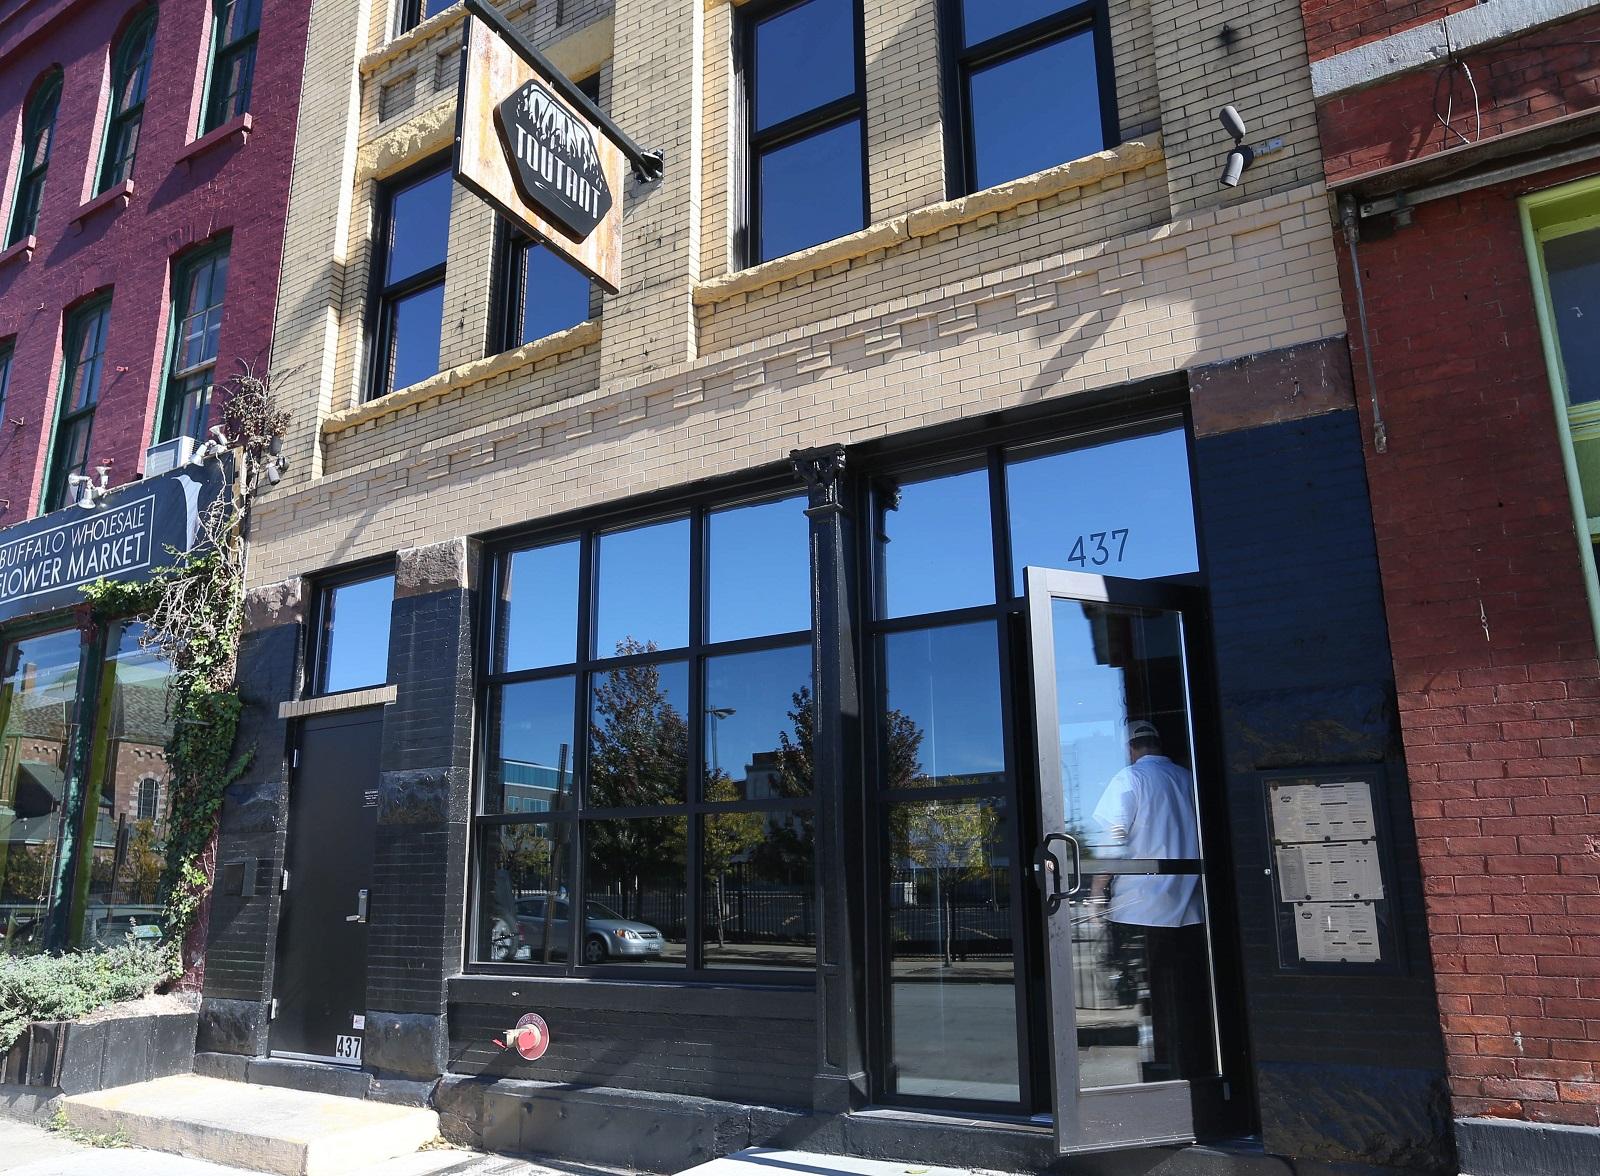 Toutant at 437 Ellicott St. in downtown Buffalo serves southern American cuisine. (Sharon Cantillon/Buffalo News)